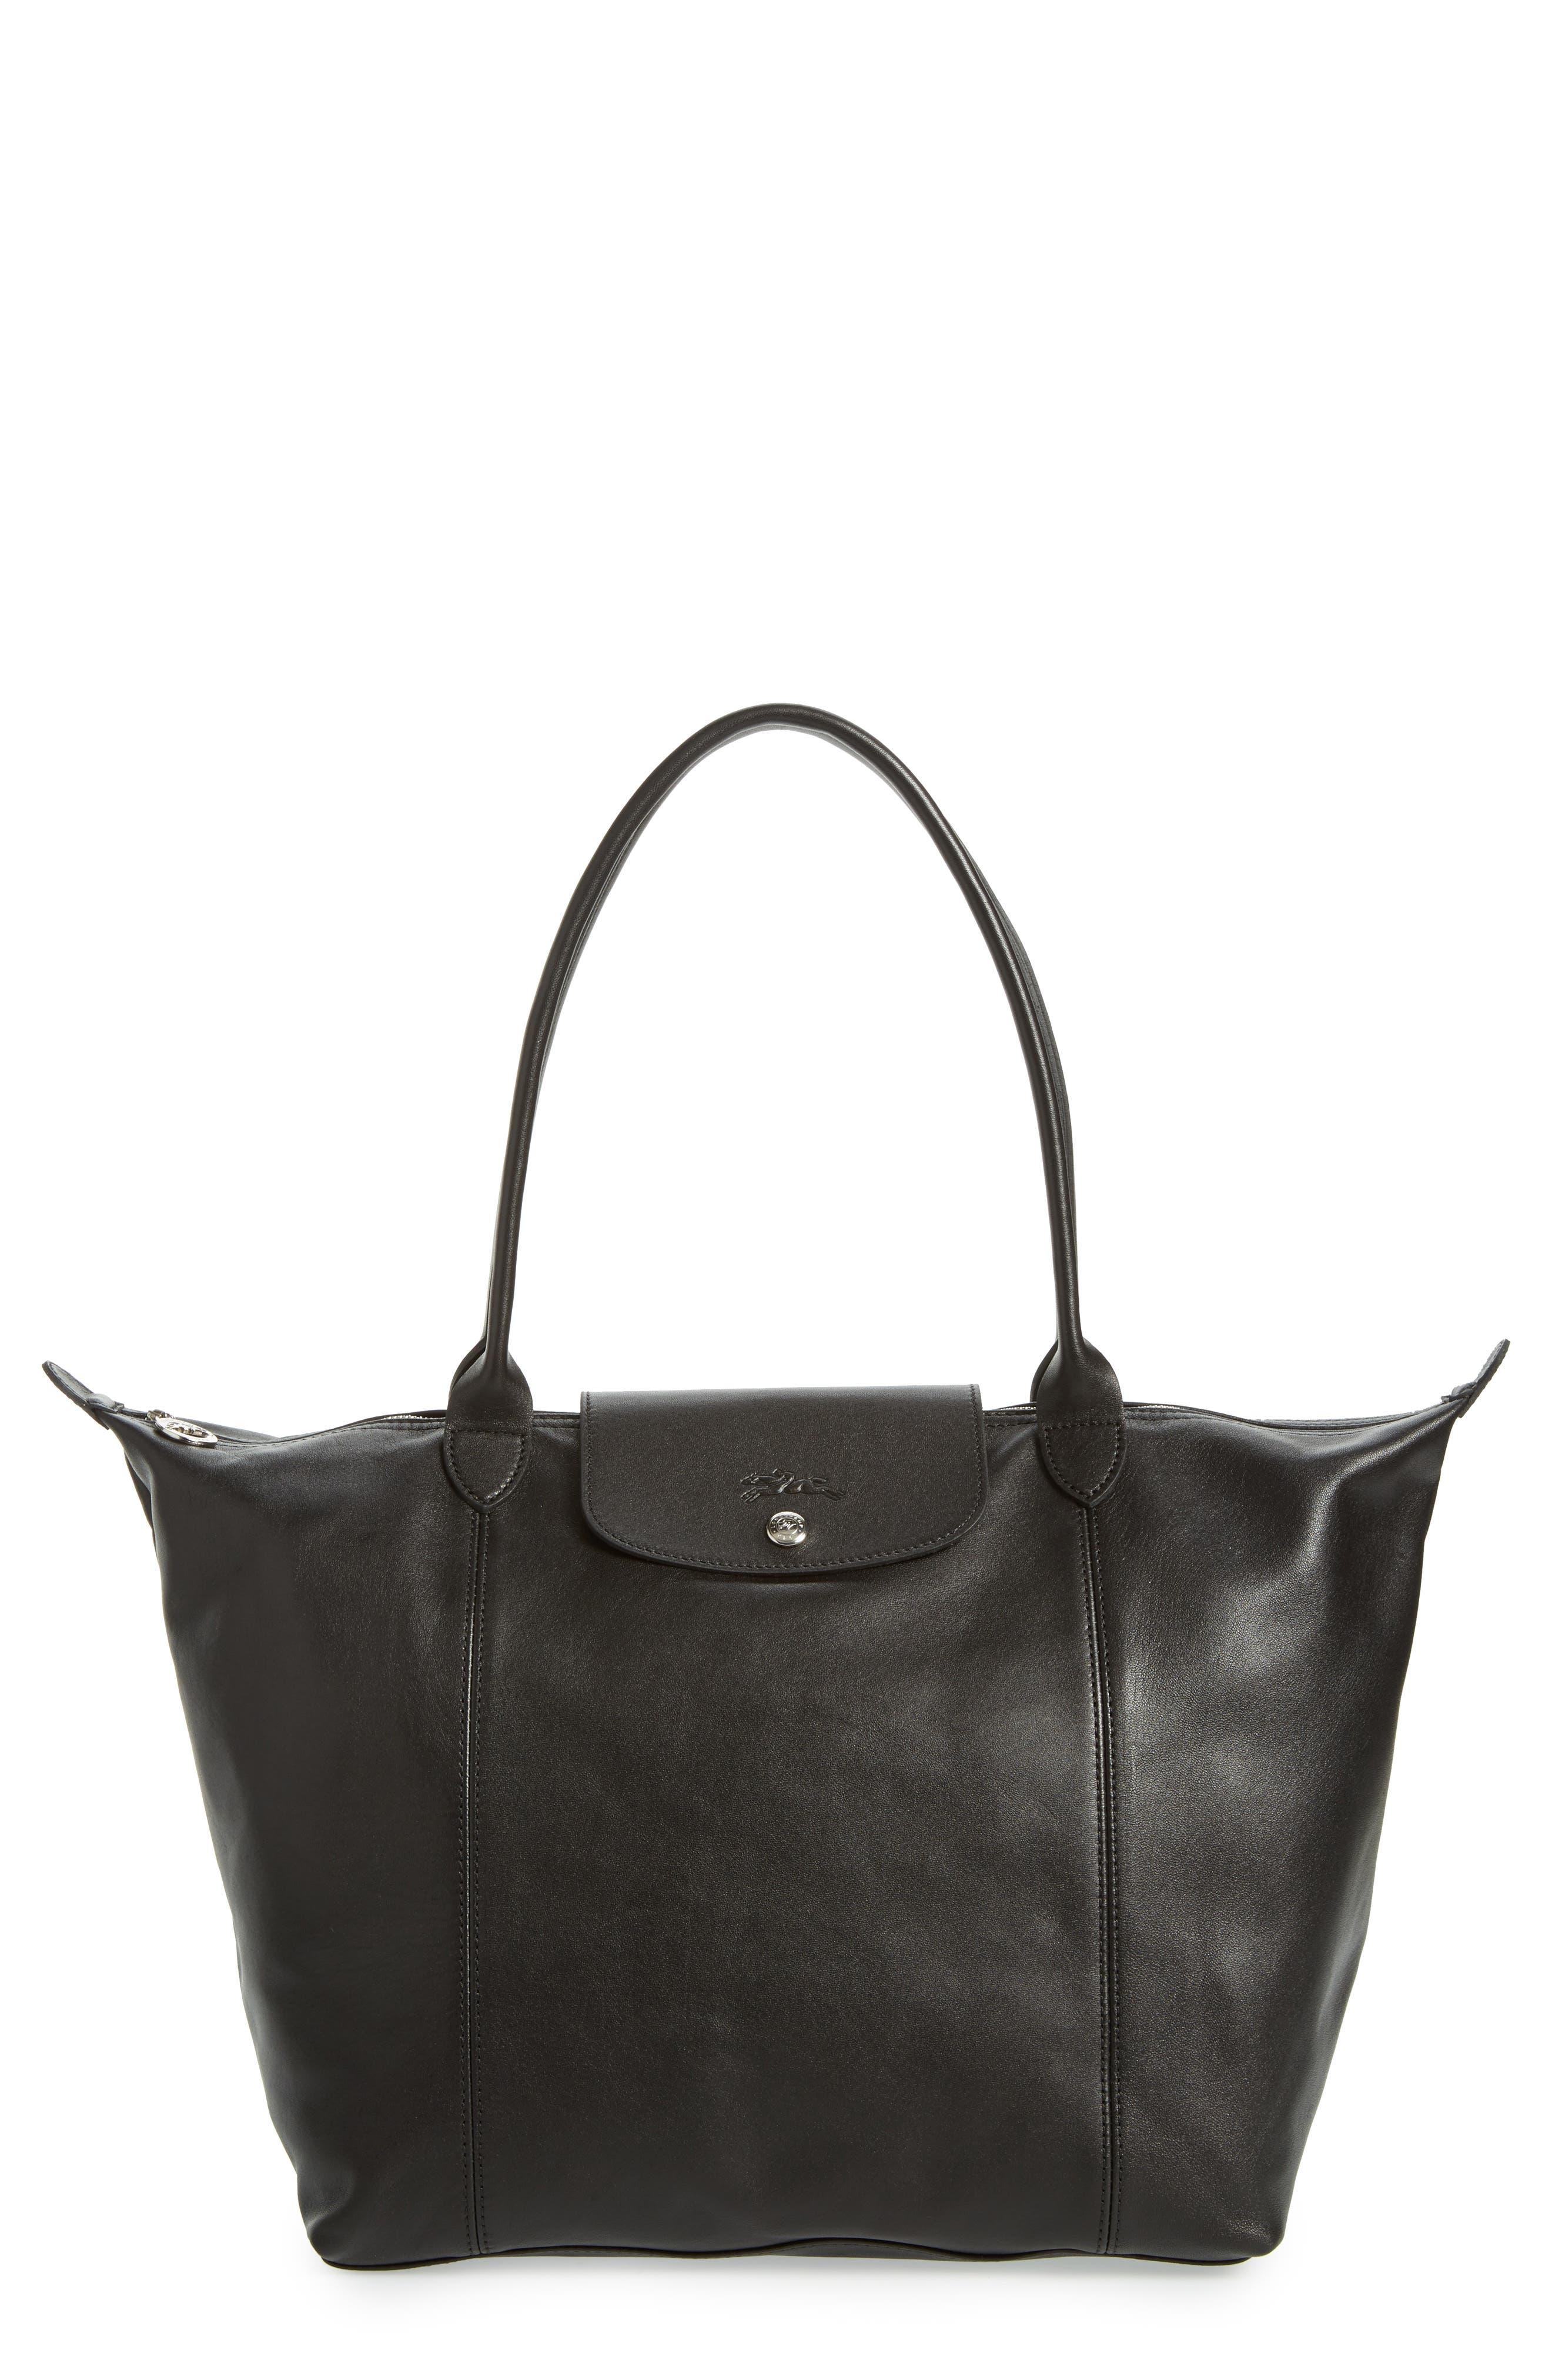 Handbags & Wallets for Women   Nordstrom